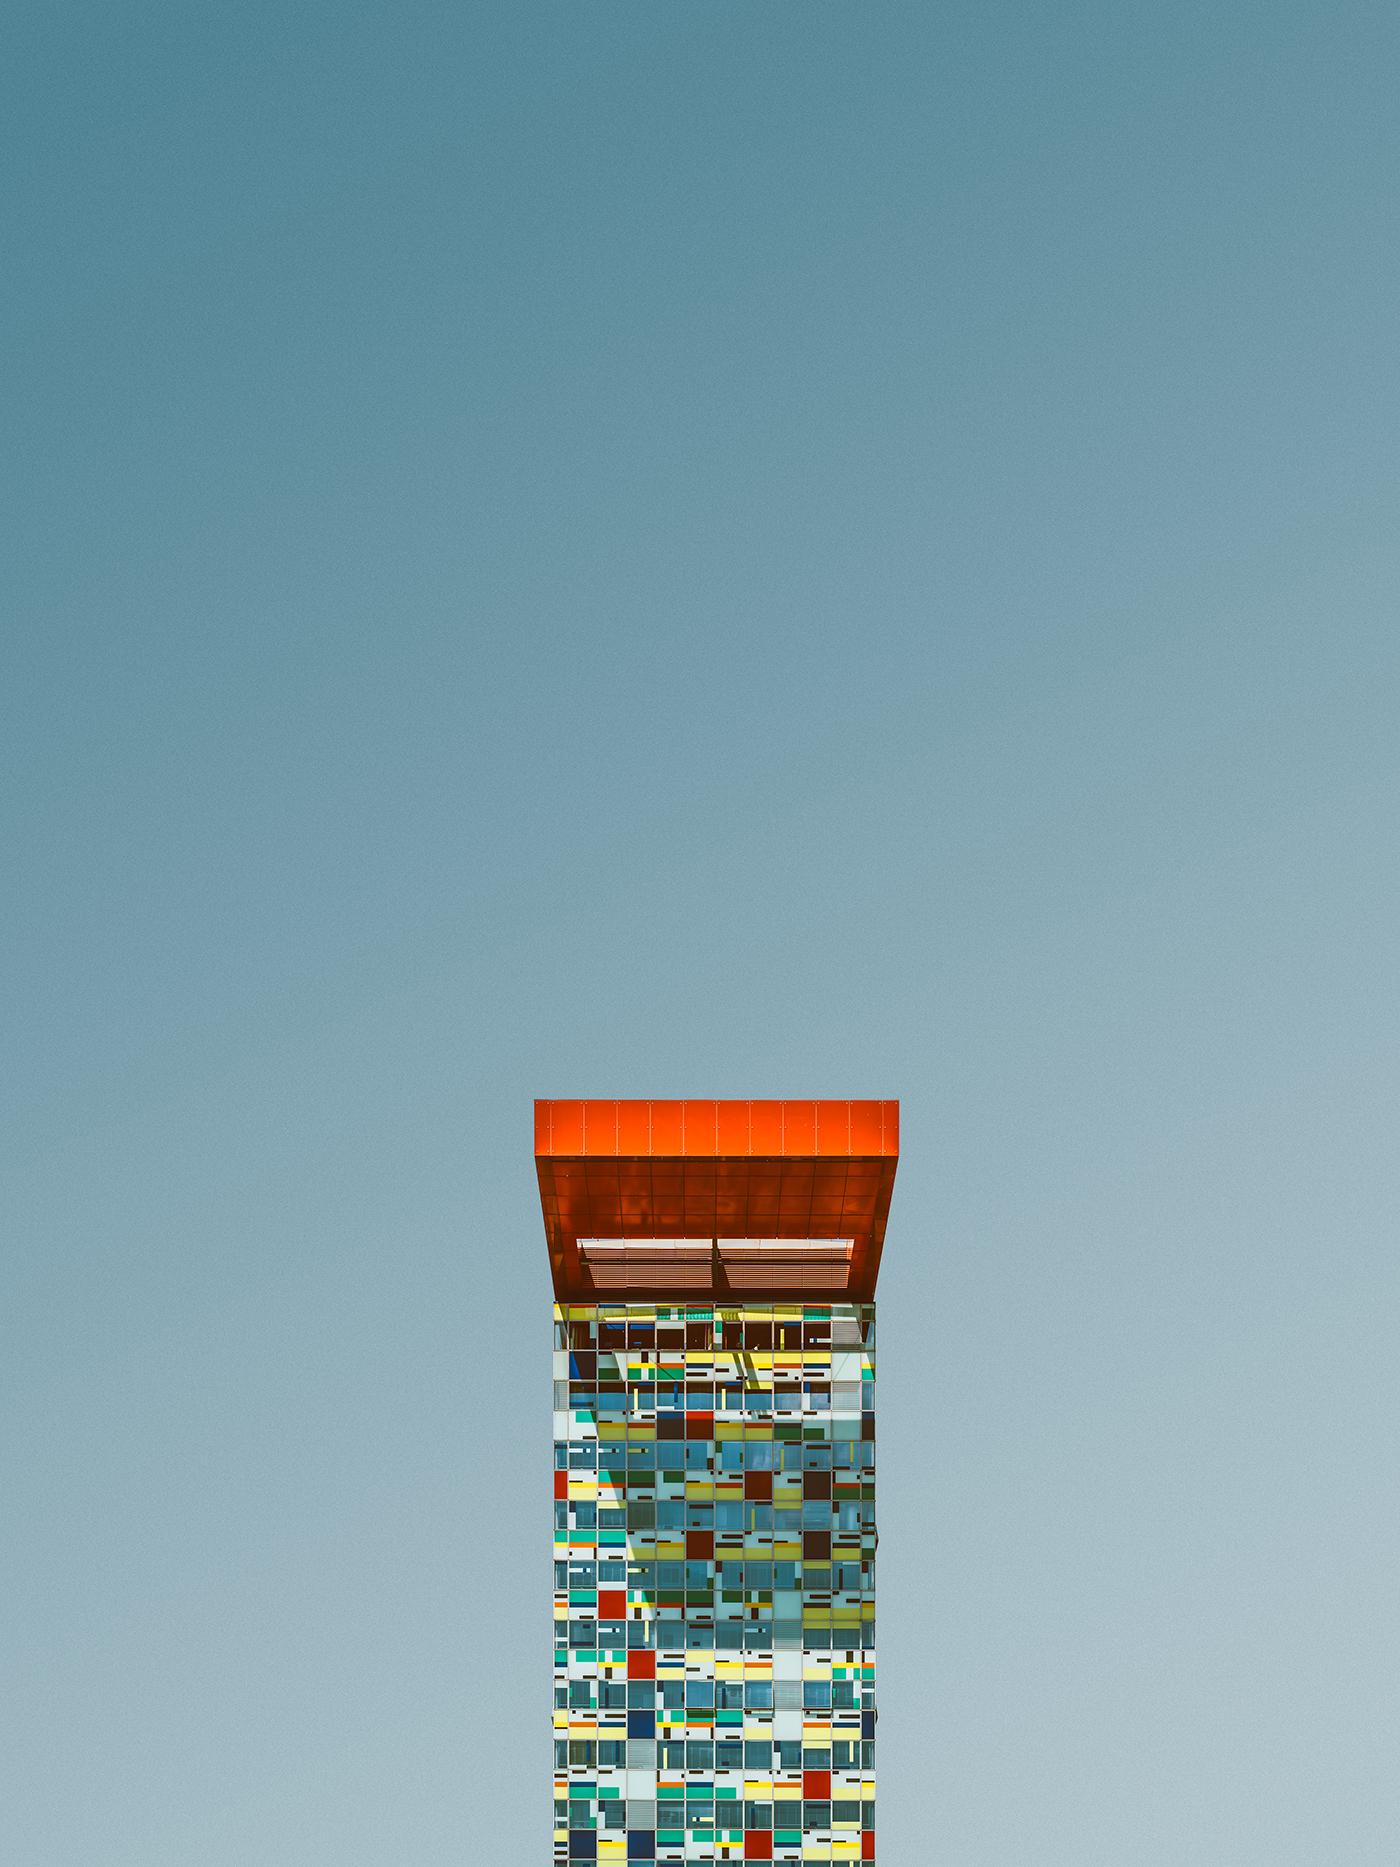 Minimalistic Architecture Around the World